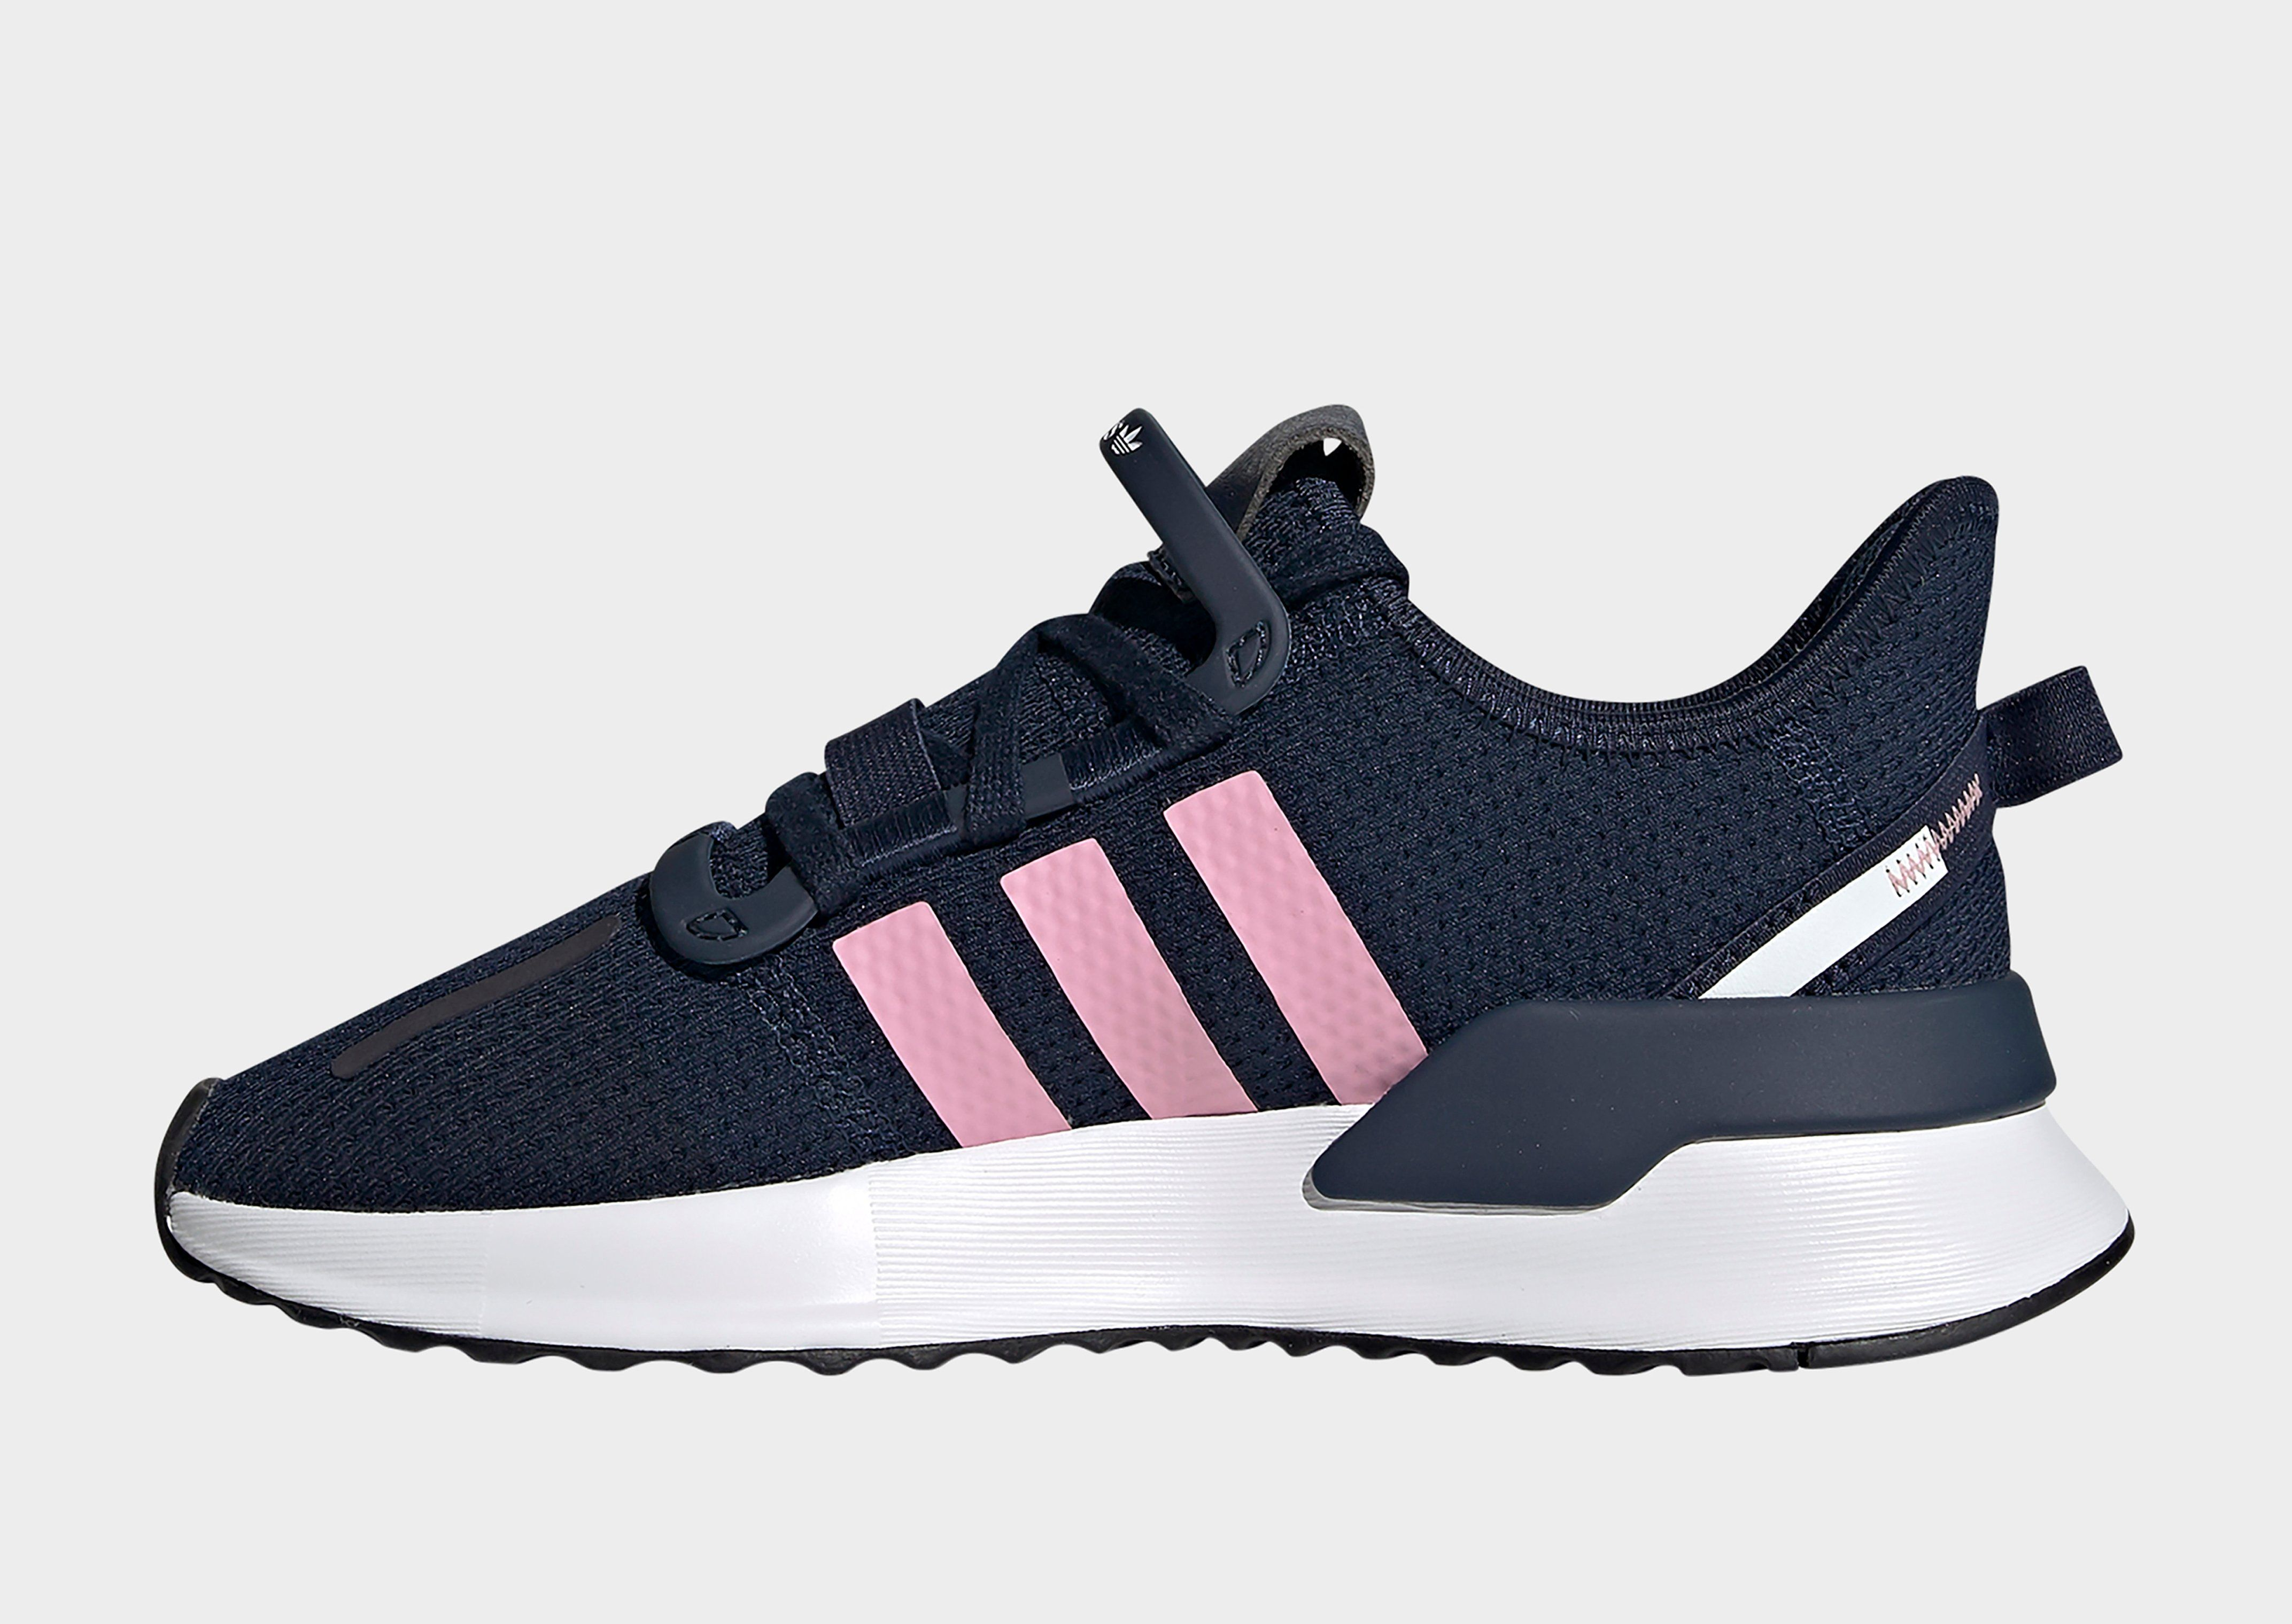 sélection premium 2ece4 9ecba adidas Originals U_Path Run Shoes | JD Sports